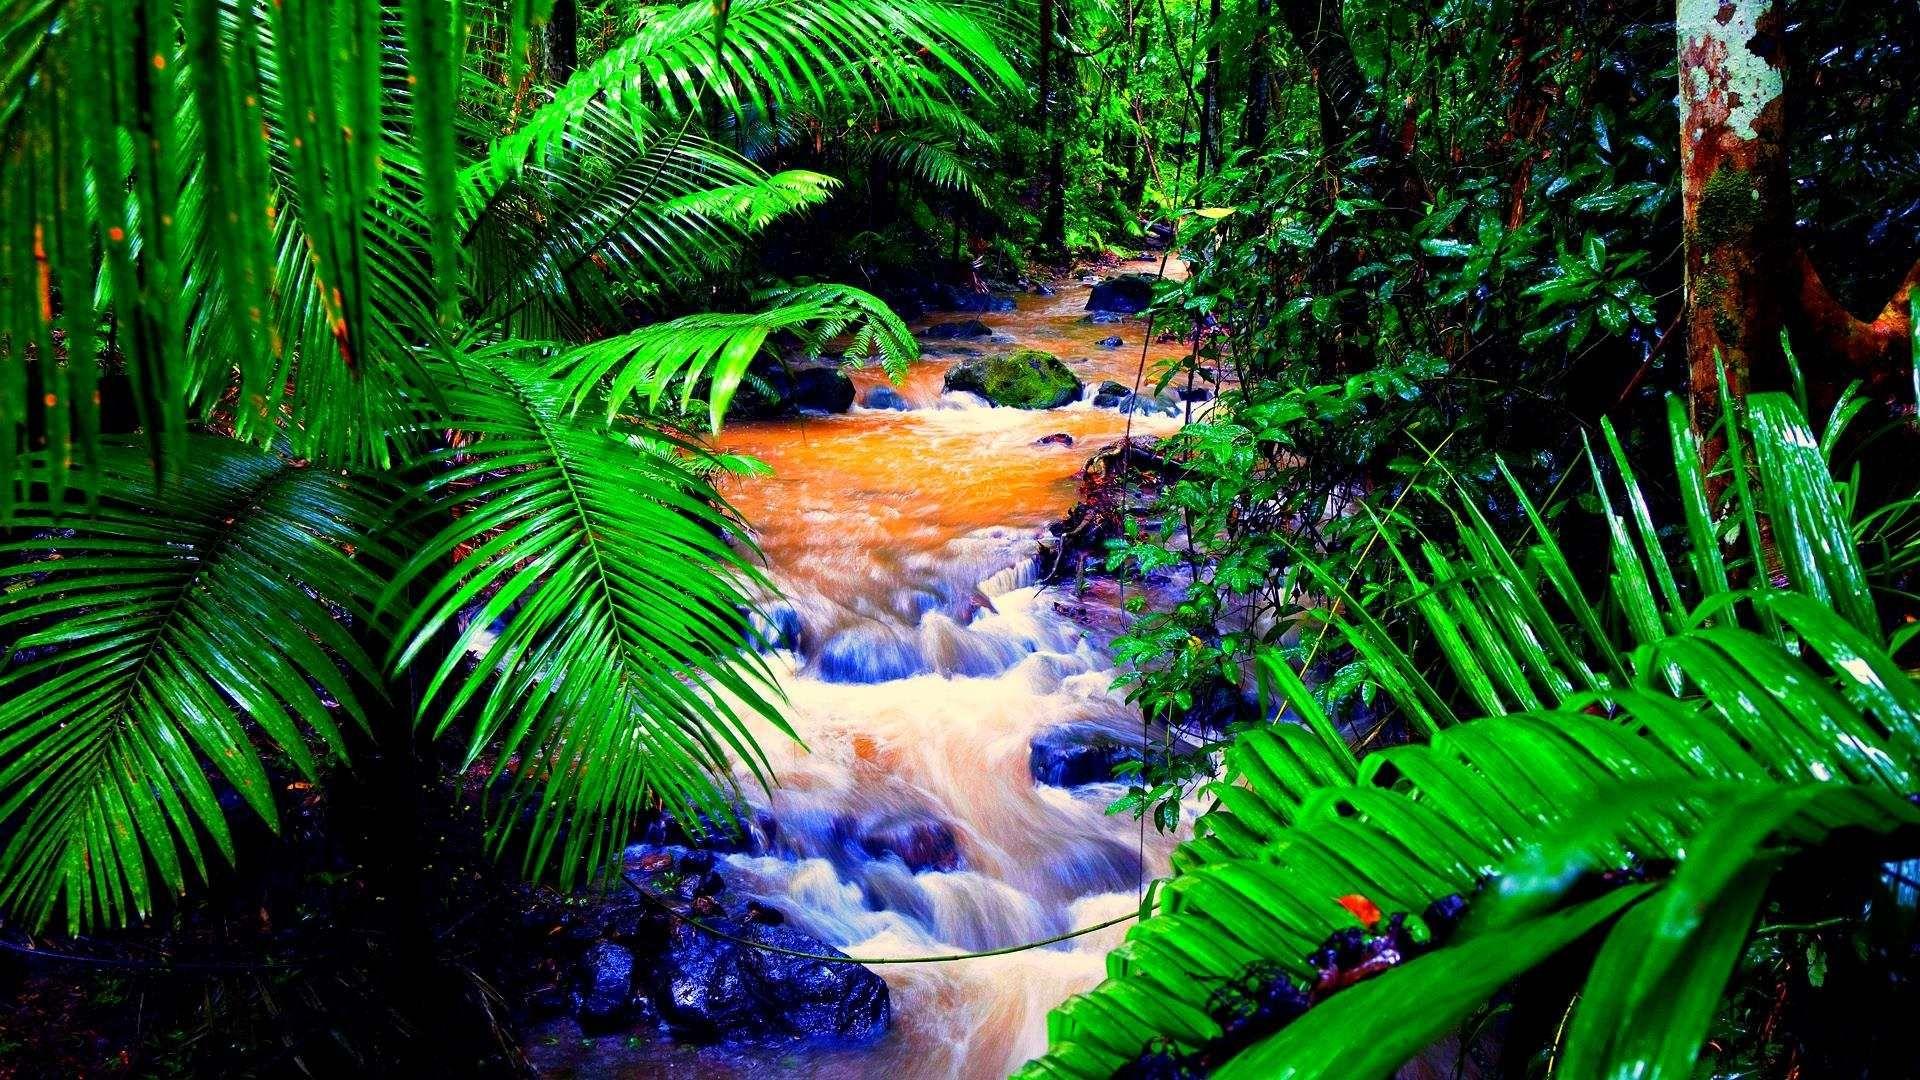 Tropical Rainforest Wallpaper For Desktop Background 1920x1080 Px 399 95 Kb Jungle Wallpaper Rainforest Pictures Nature Desktop Wallpaper